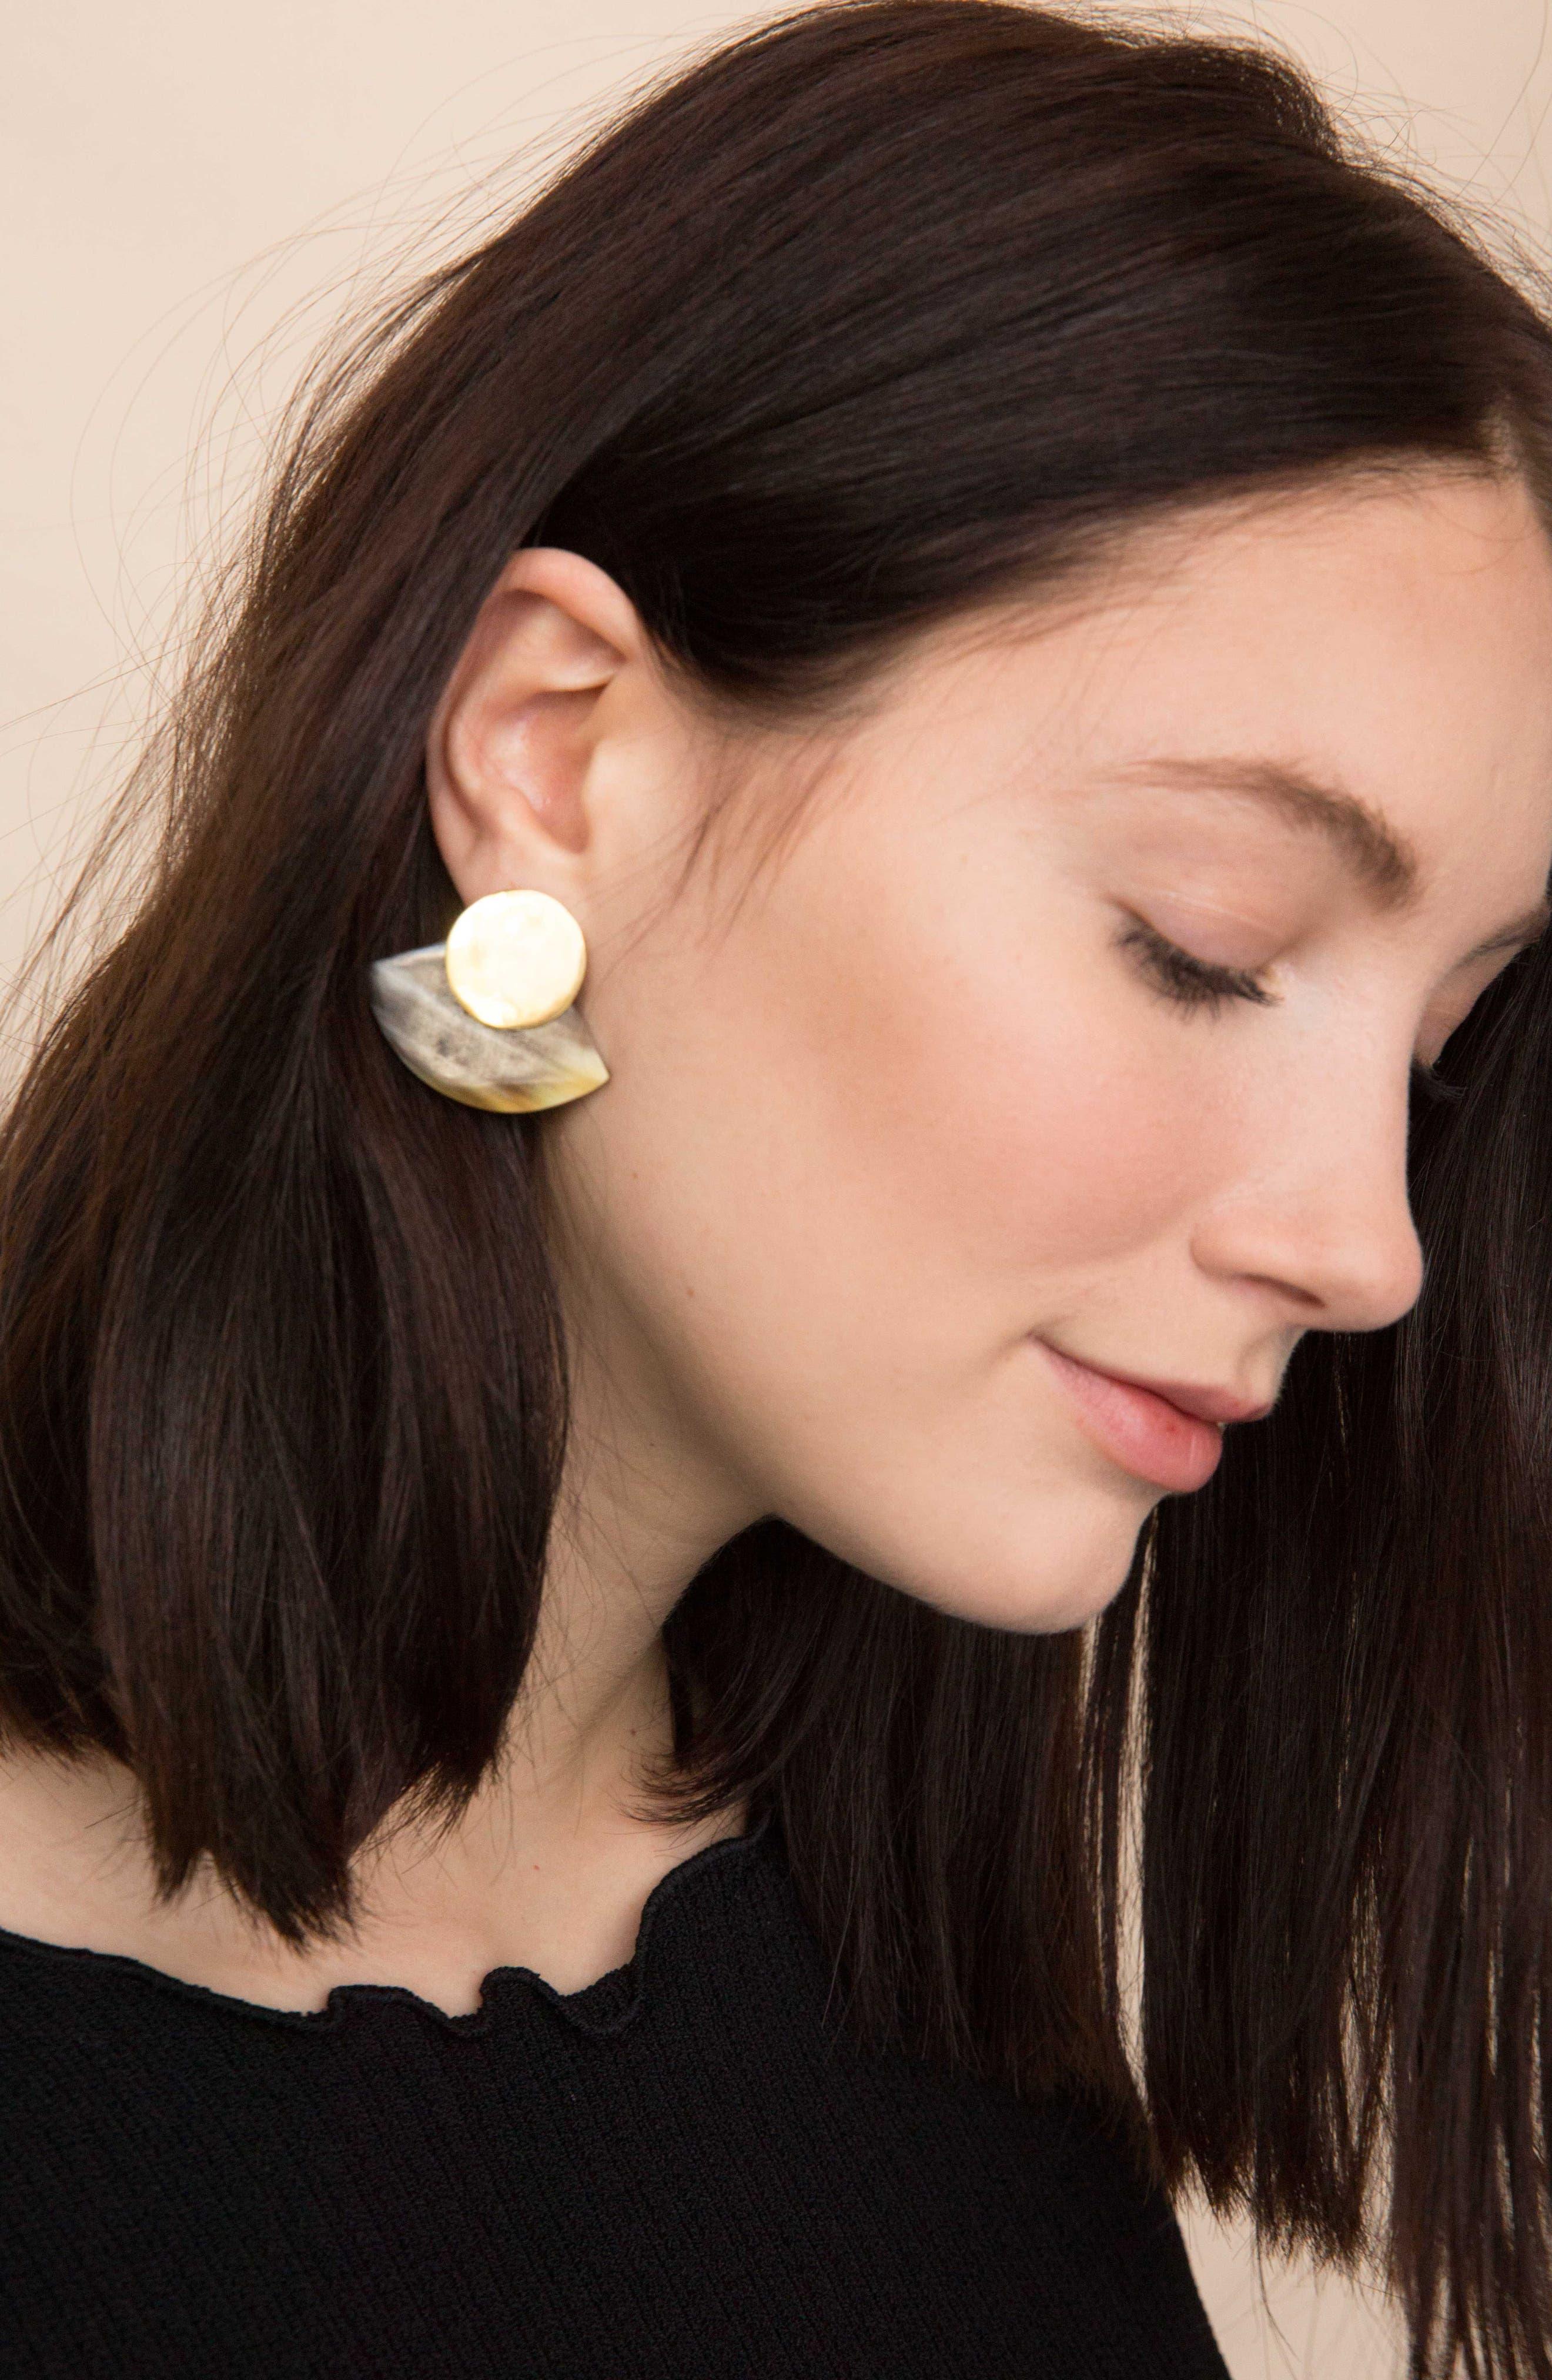 Horn Paddle Stud Earrings,                             Alternate thumbnail 3, color,                             Natural/ Brass